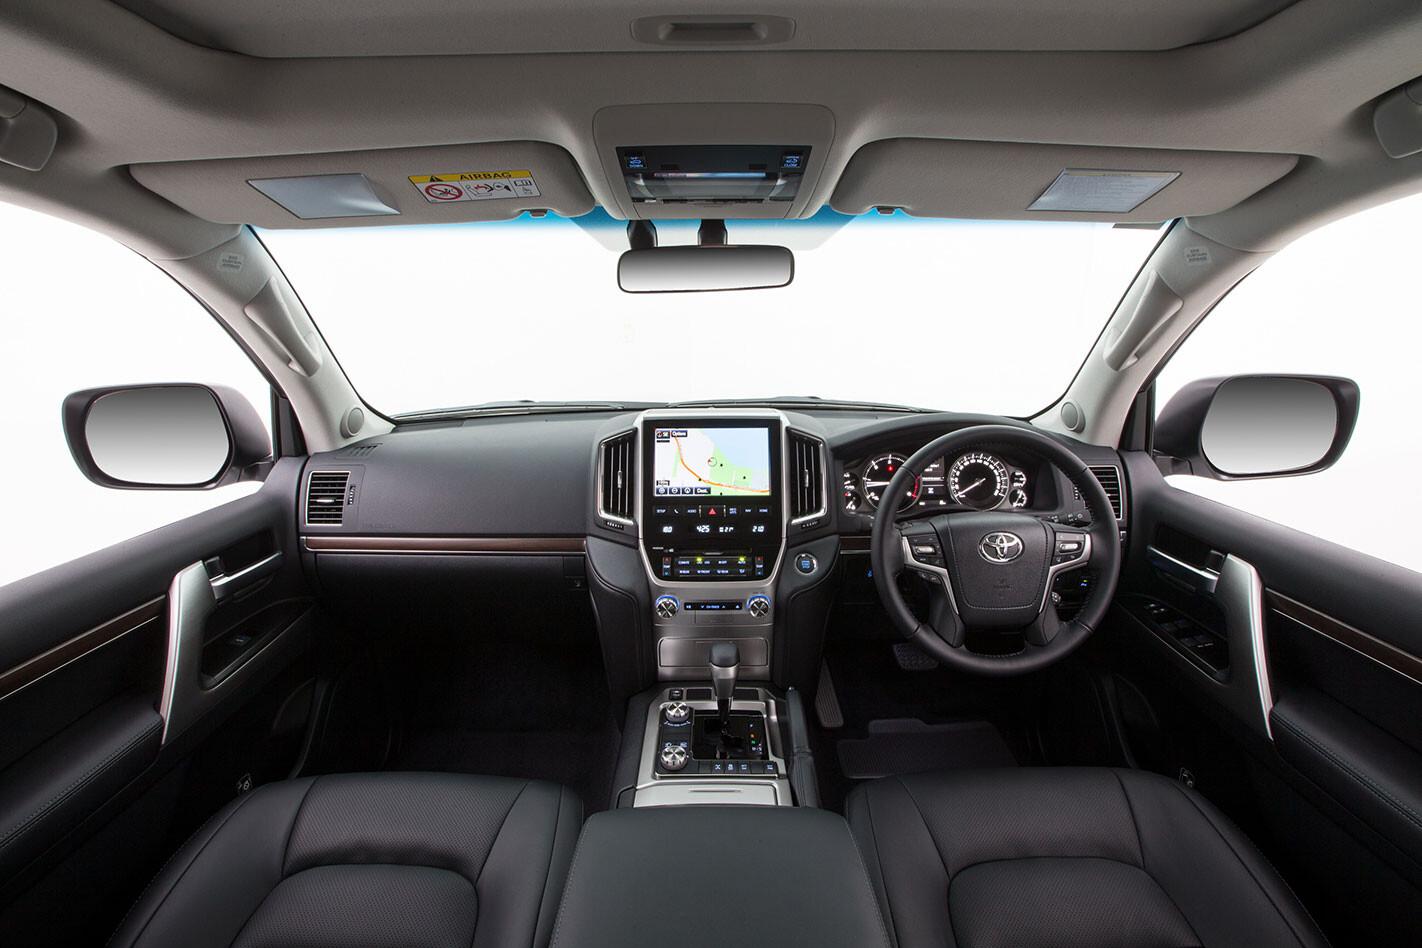 https://d3lp4xedbqa8a5.cloudfront.net/s3/digital-cougar-assets/whichcar/2016/04/08/2513/Toyota-LandCruiser-VX-2016-dash.jpg